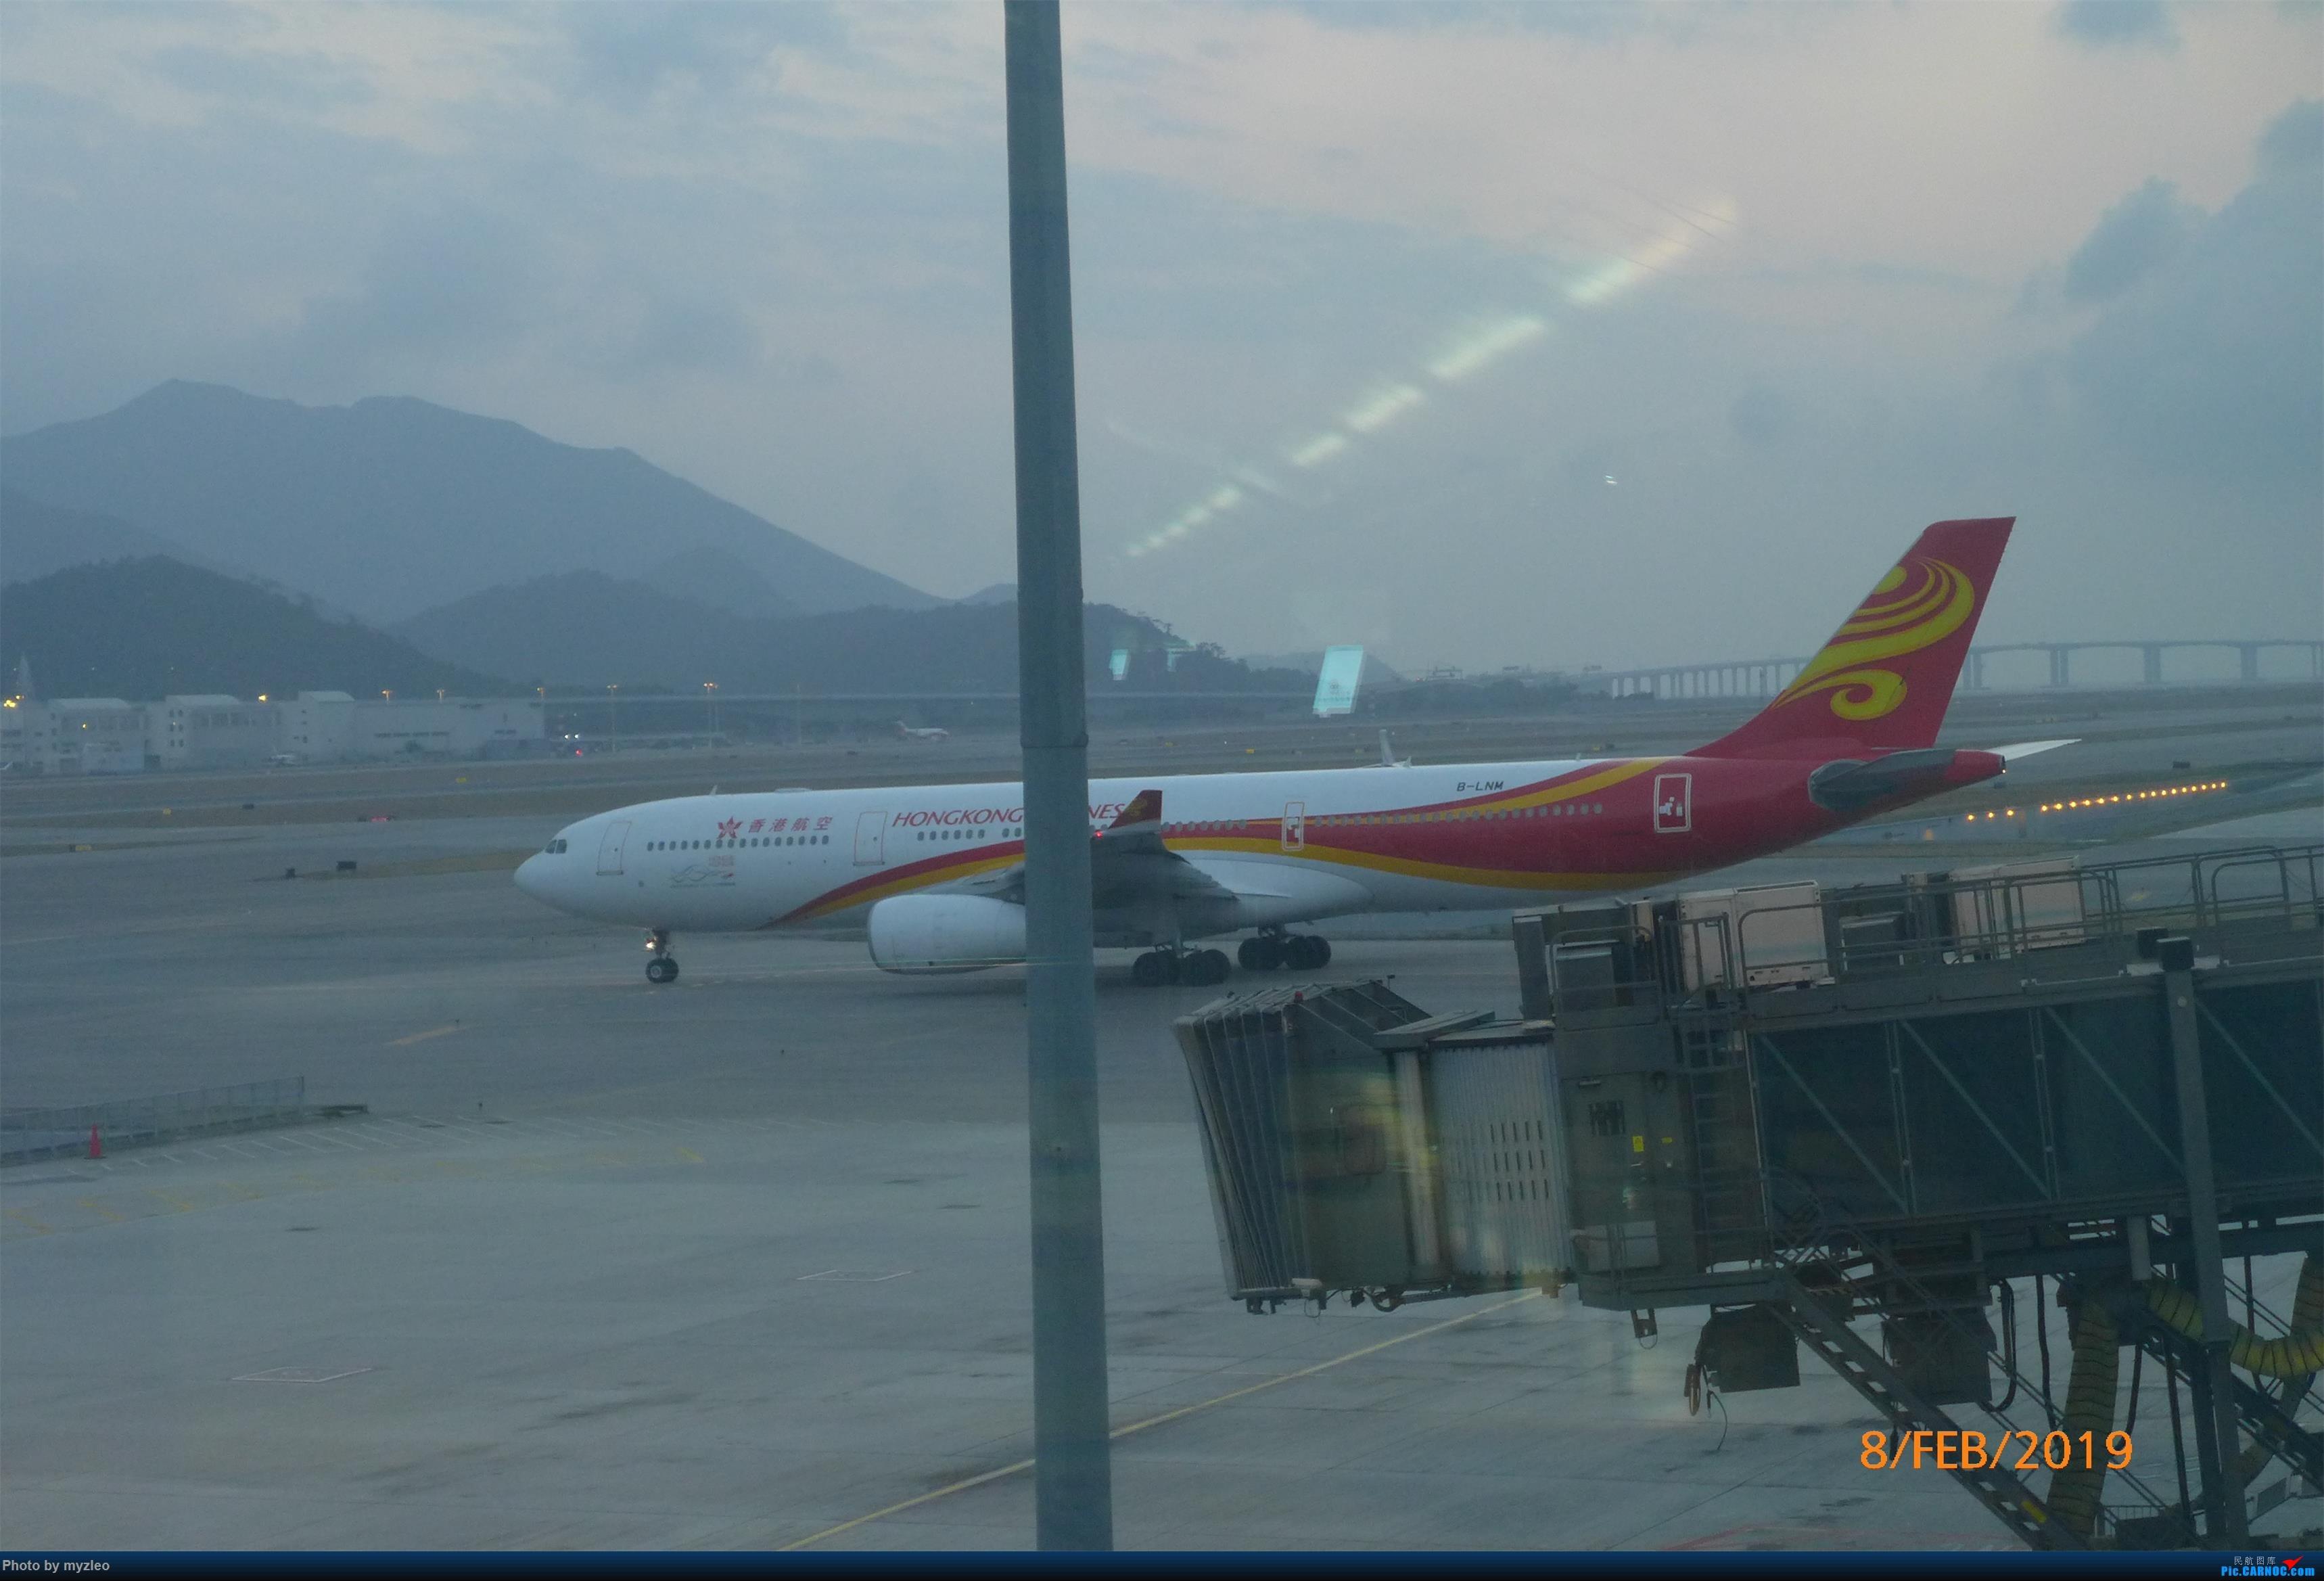 Re:[原创]【myzleo的游记4.5】十年之约(5)在香港的最后一天,搭乘港航333回沪 AIRBUS A330-300 B-LNM 中国香港国际机场